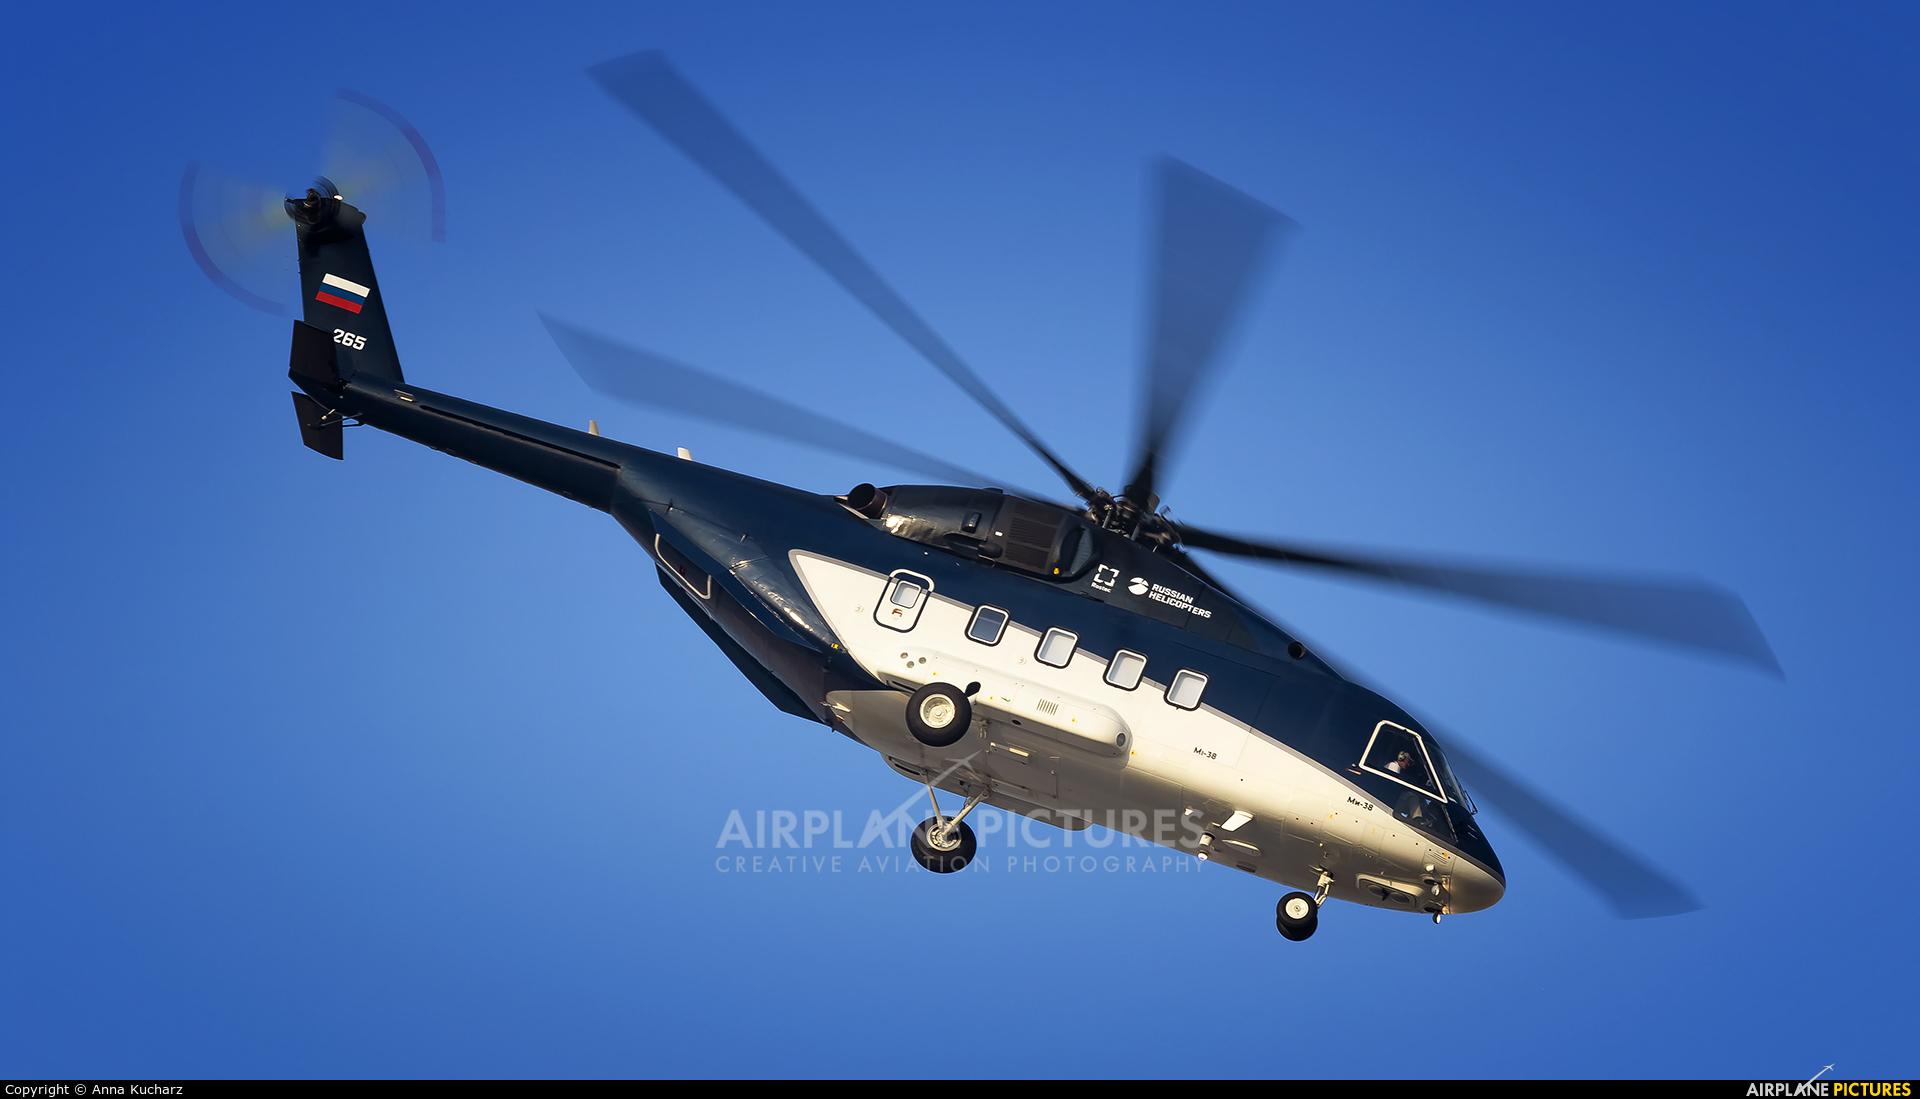 Russian Helicopters 265 aircraft at Jebel Ali Al Maktoum Intl